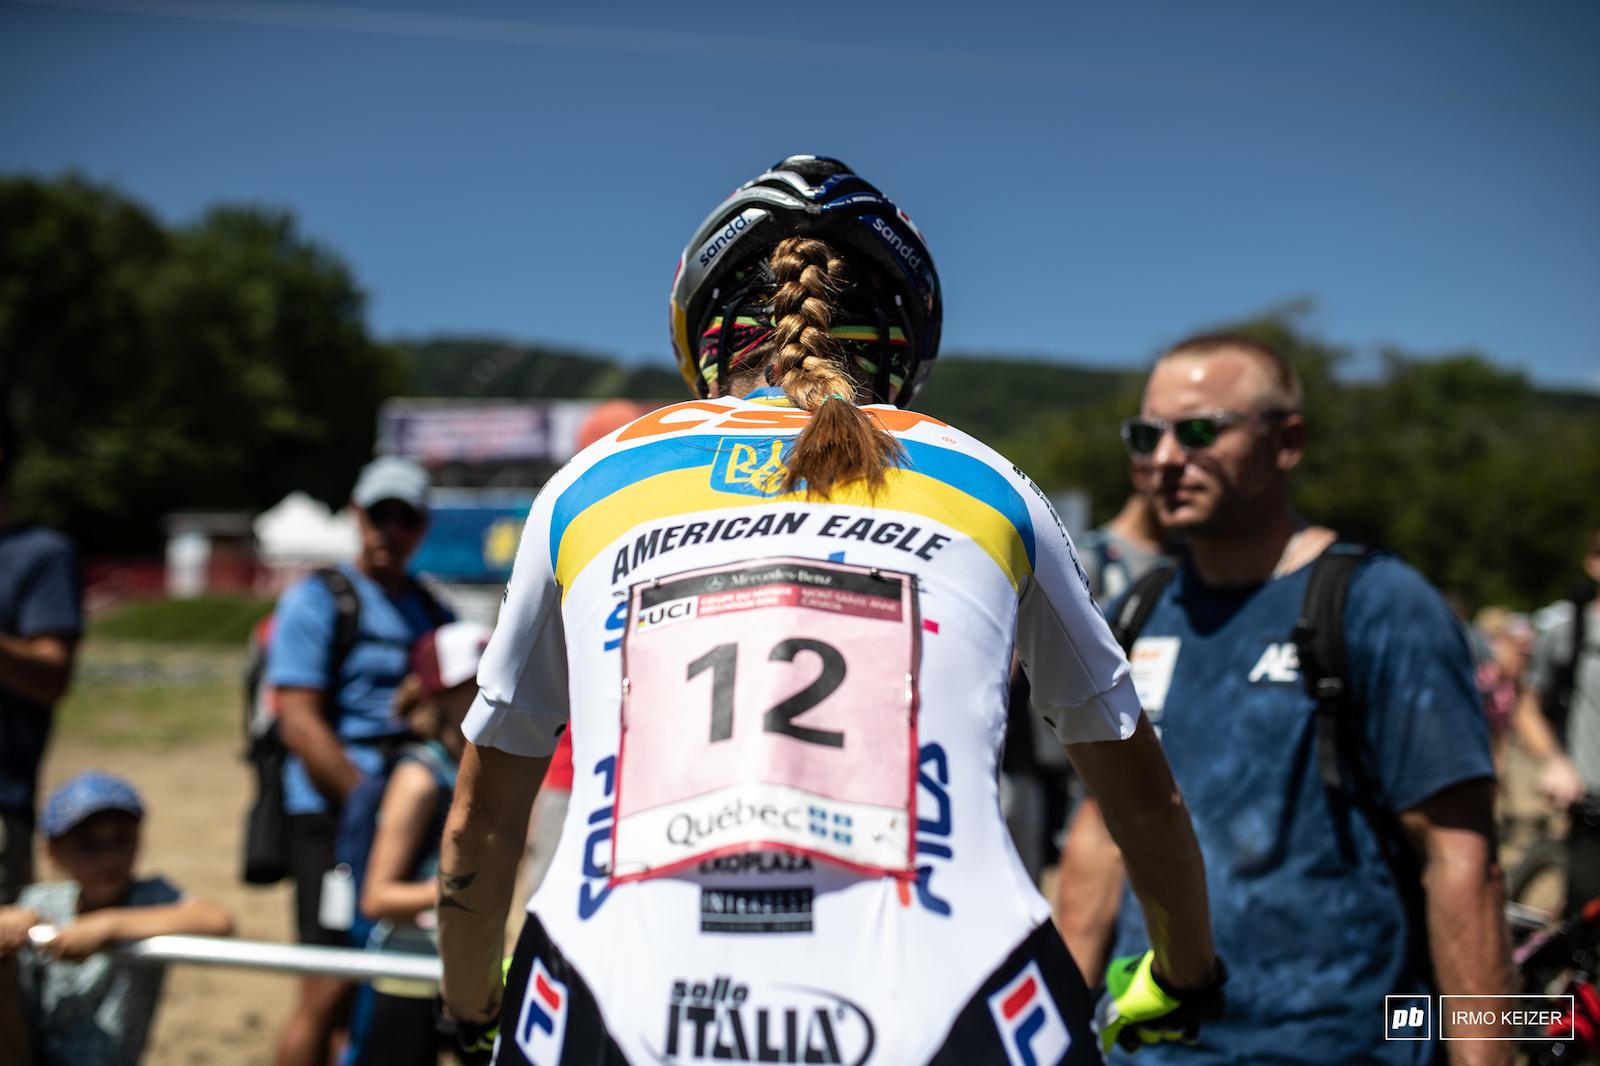 Yana Belomoina last year s winner warming up for the race.